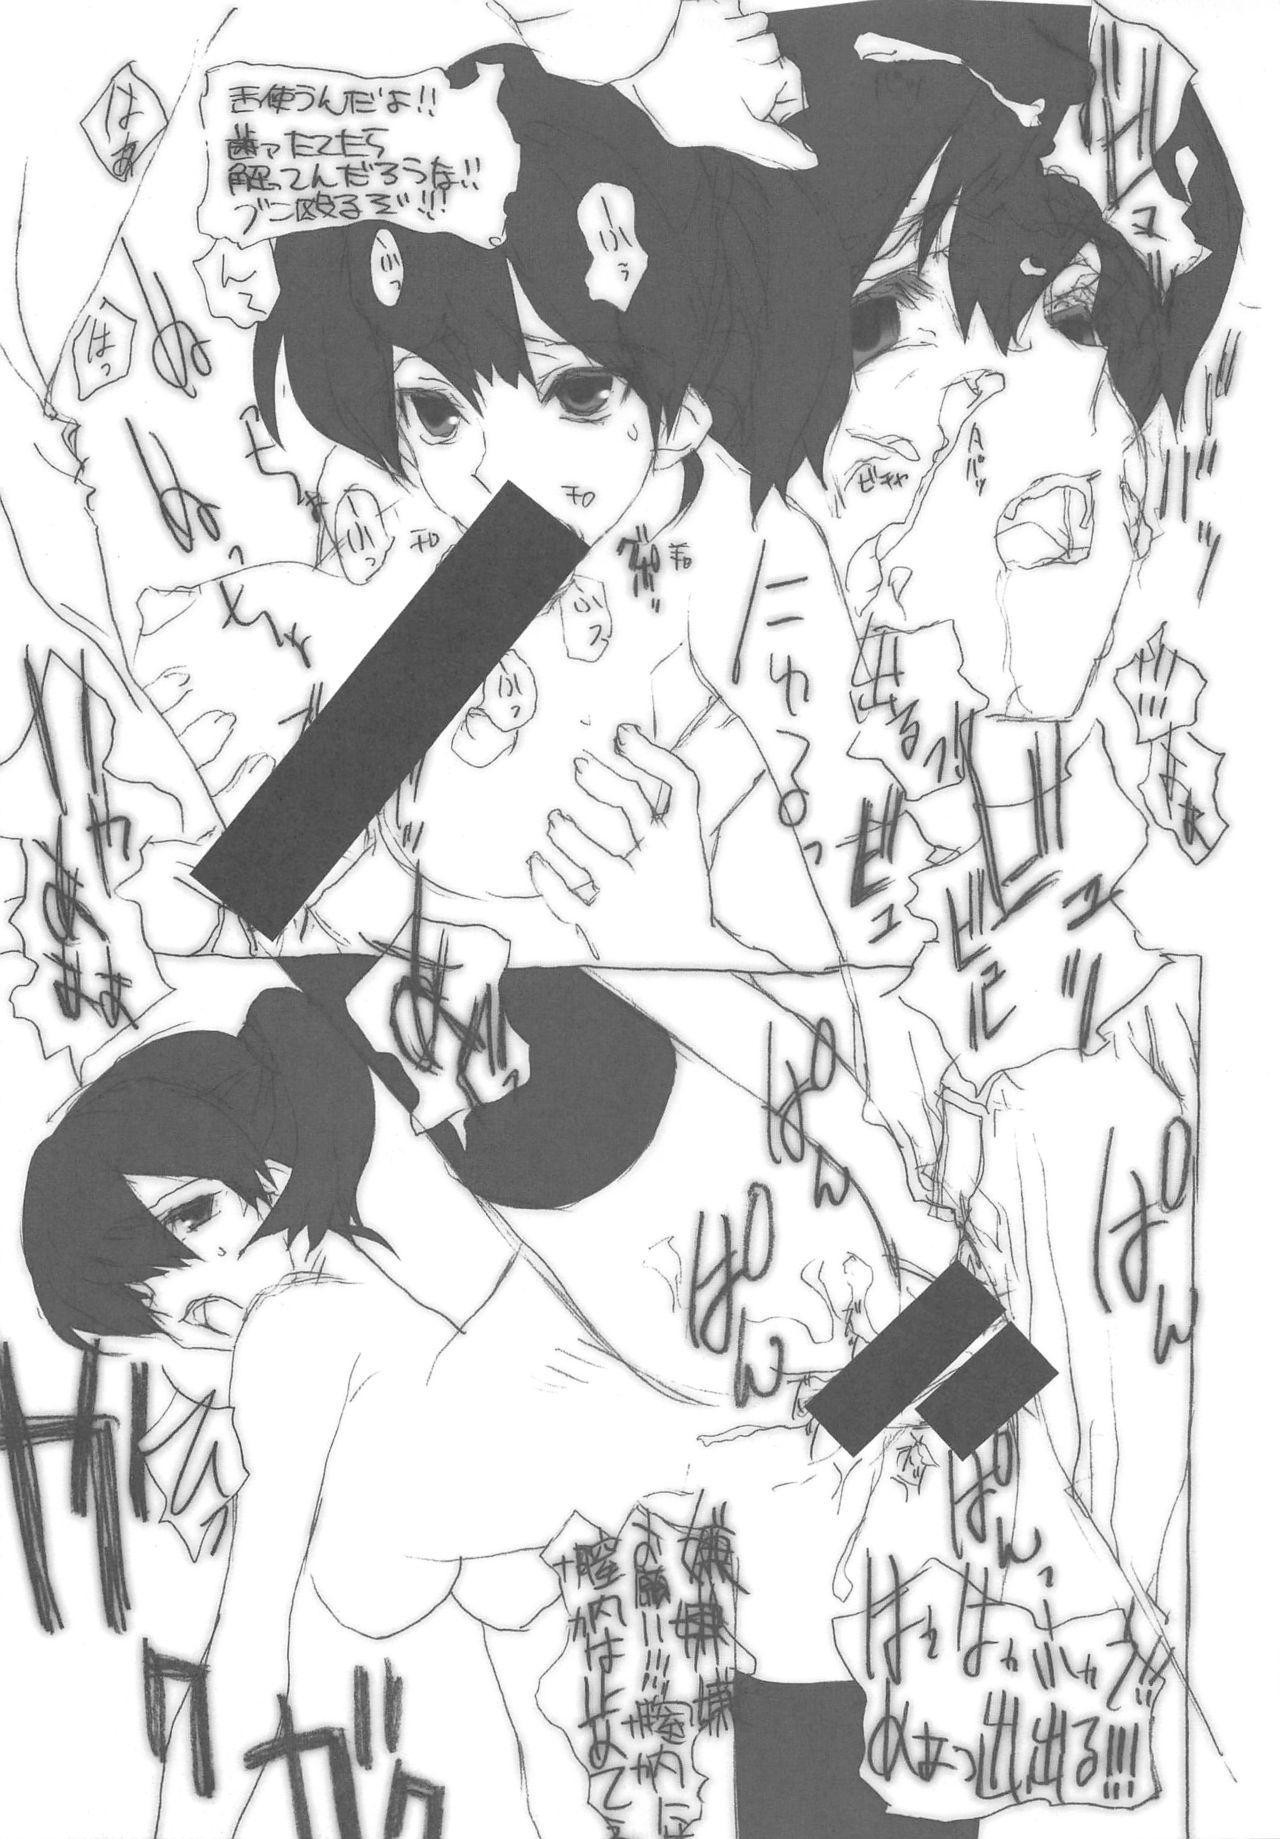 (C85) [Nise-Jyuusyofutei (Nakamura Takeshi)] Hokui 30-do 13-pun 59-byou Seikei 179-do 7-fun 12-byou (Kantai Collection -KanColle-) 19